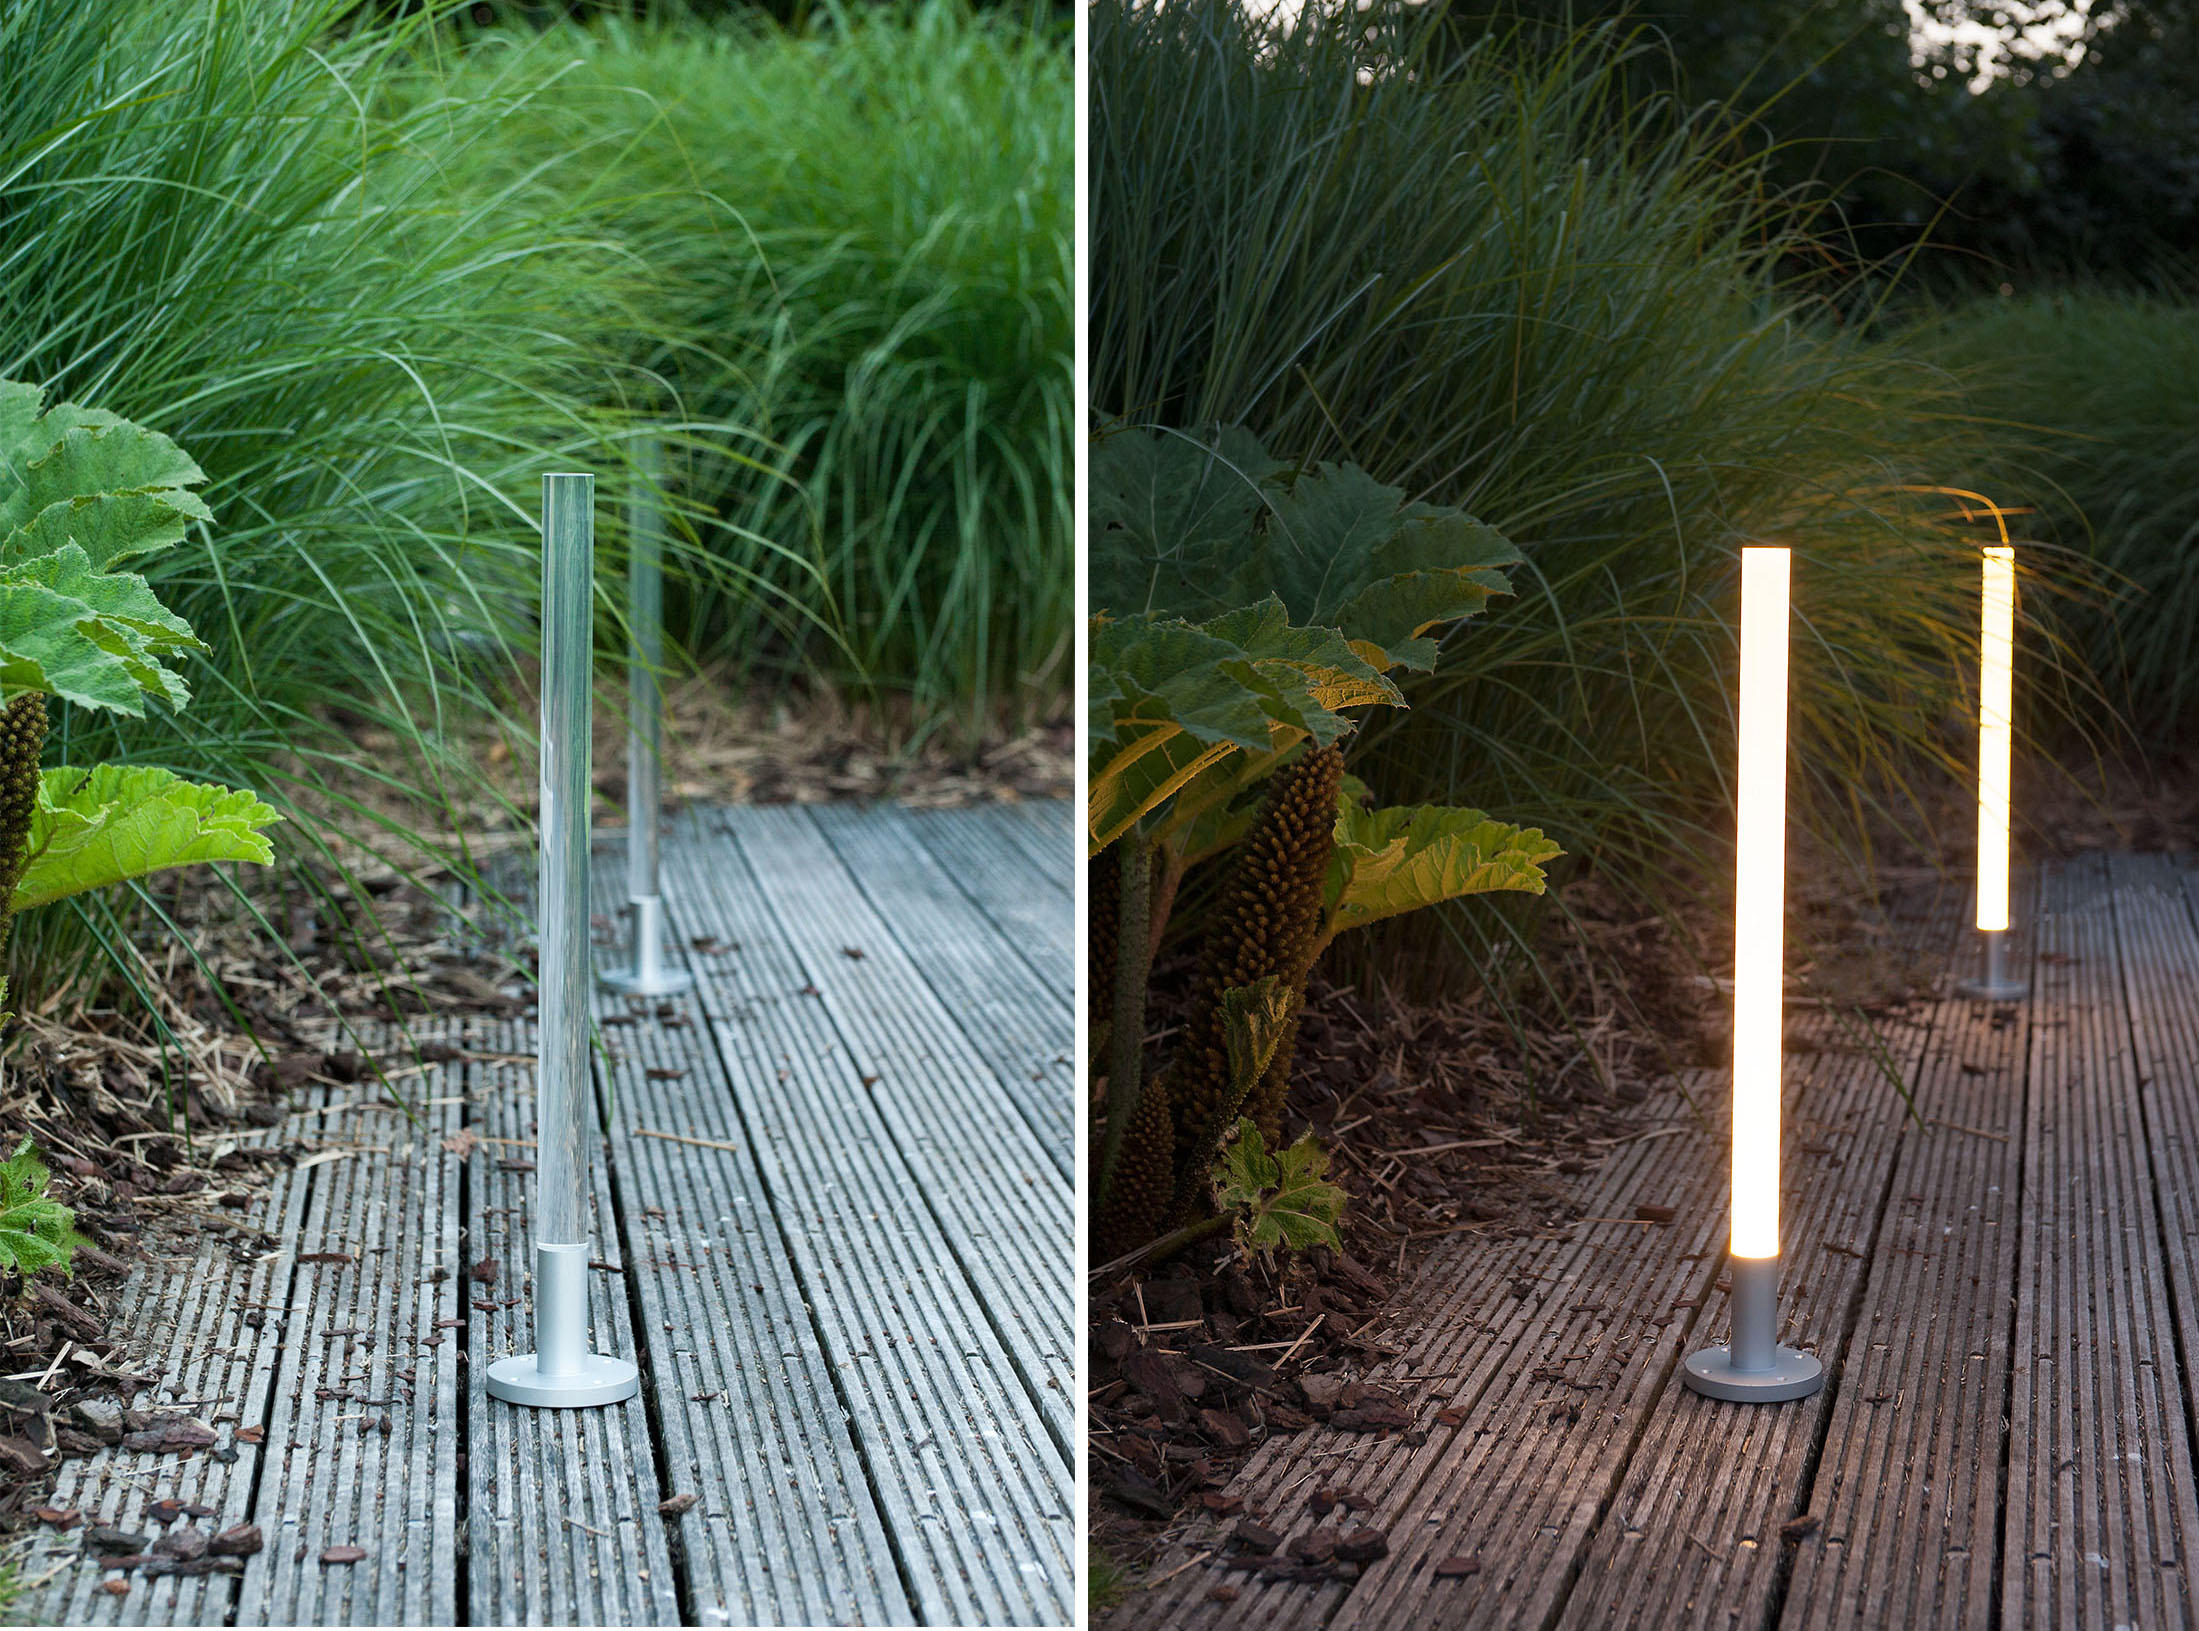 Ghost saber lampada da esterni lampade outdoor piantane